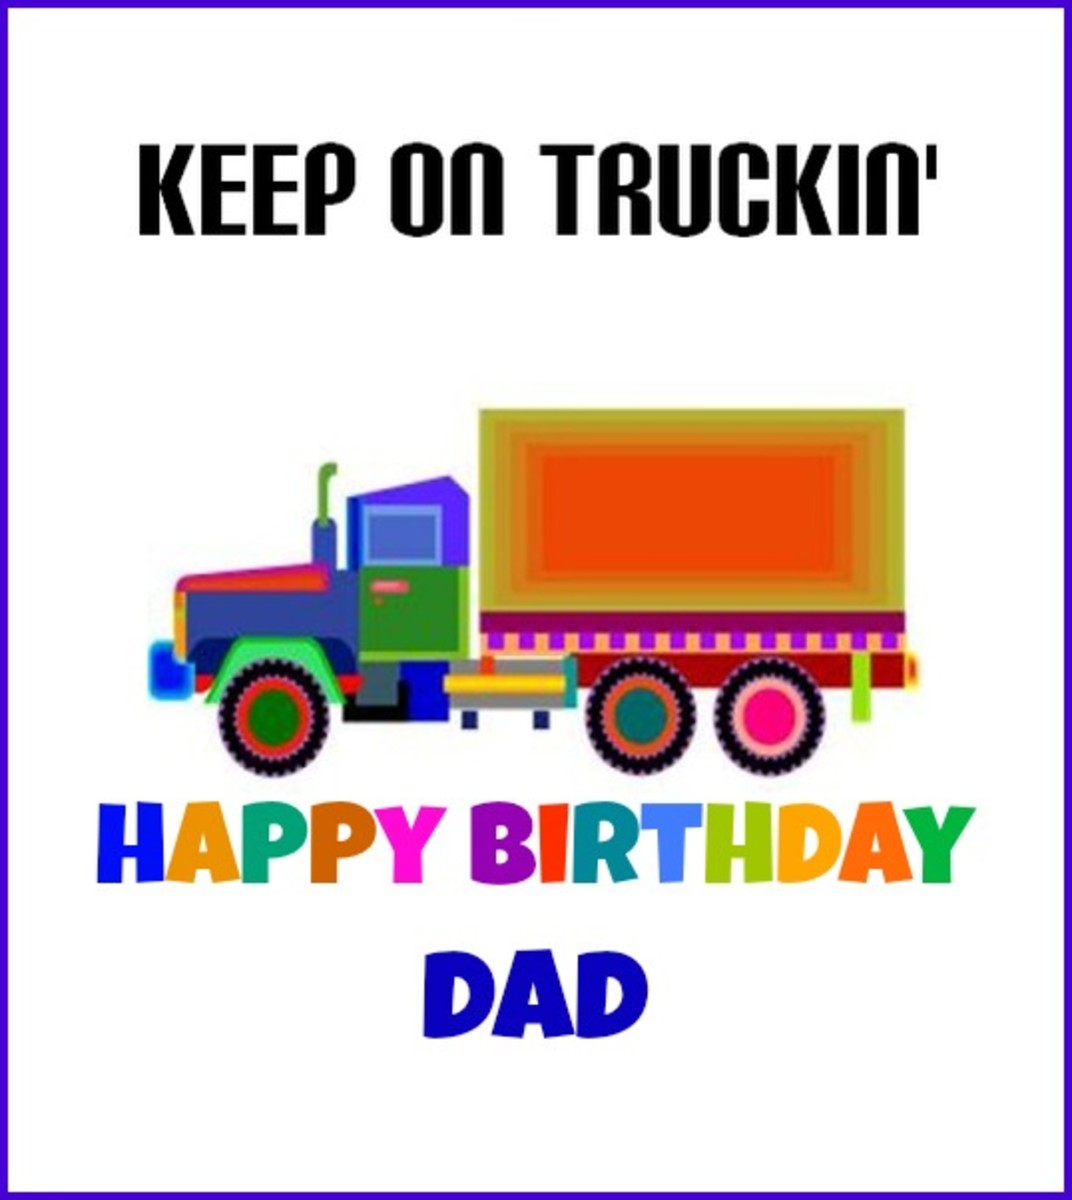 ECard for Dad's Birthday